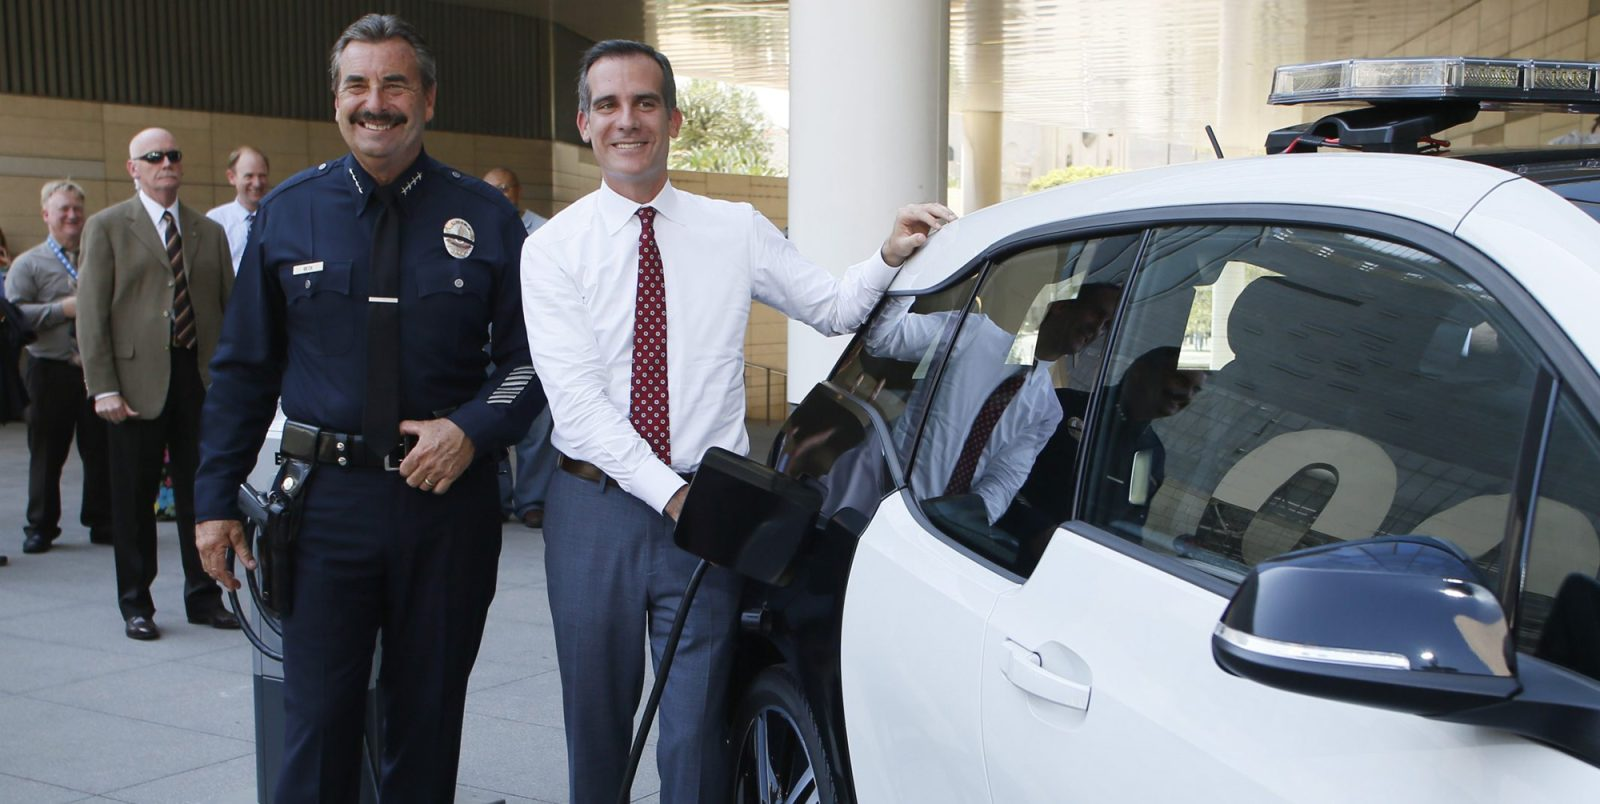 Los Angeles sets aggressive 2028 EV targets: 80% of all vehicle sales